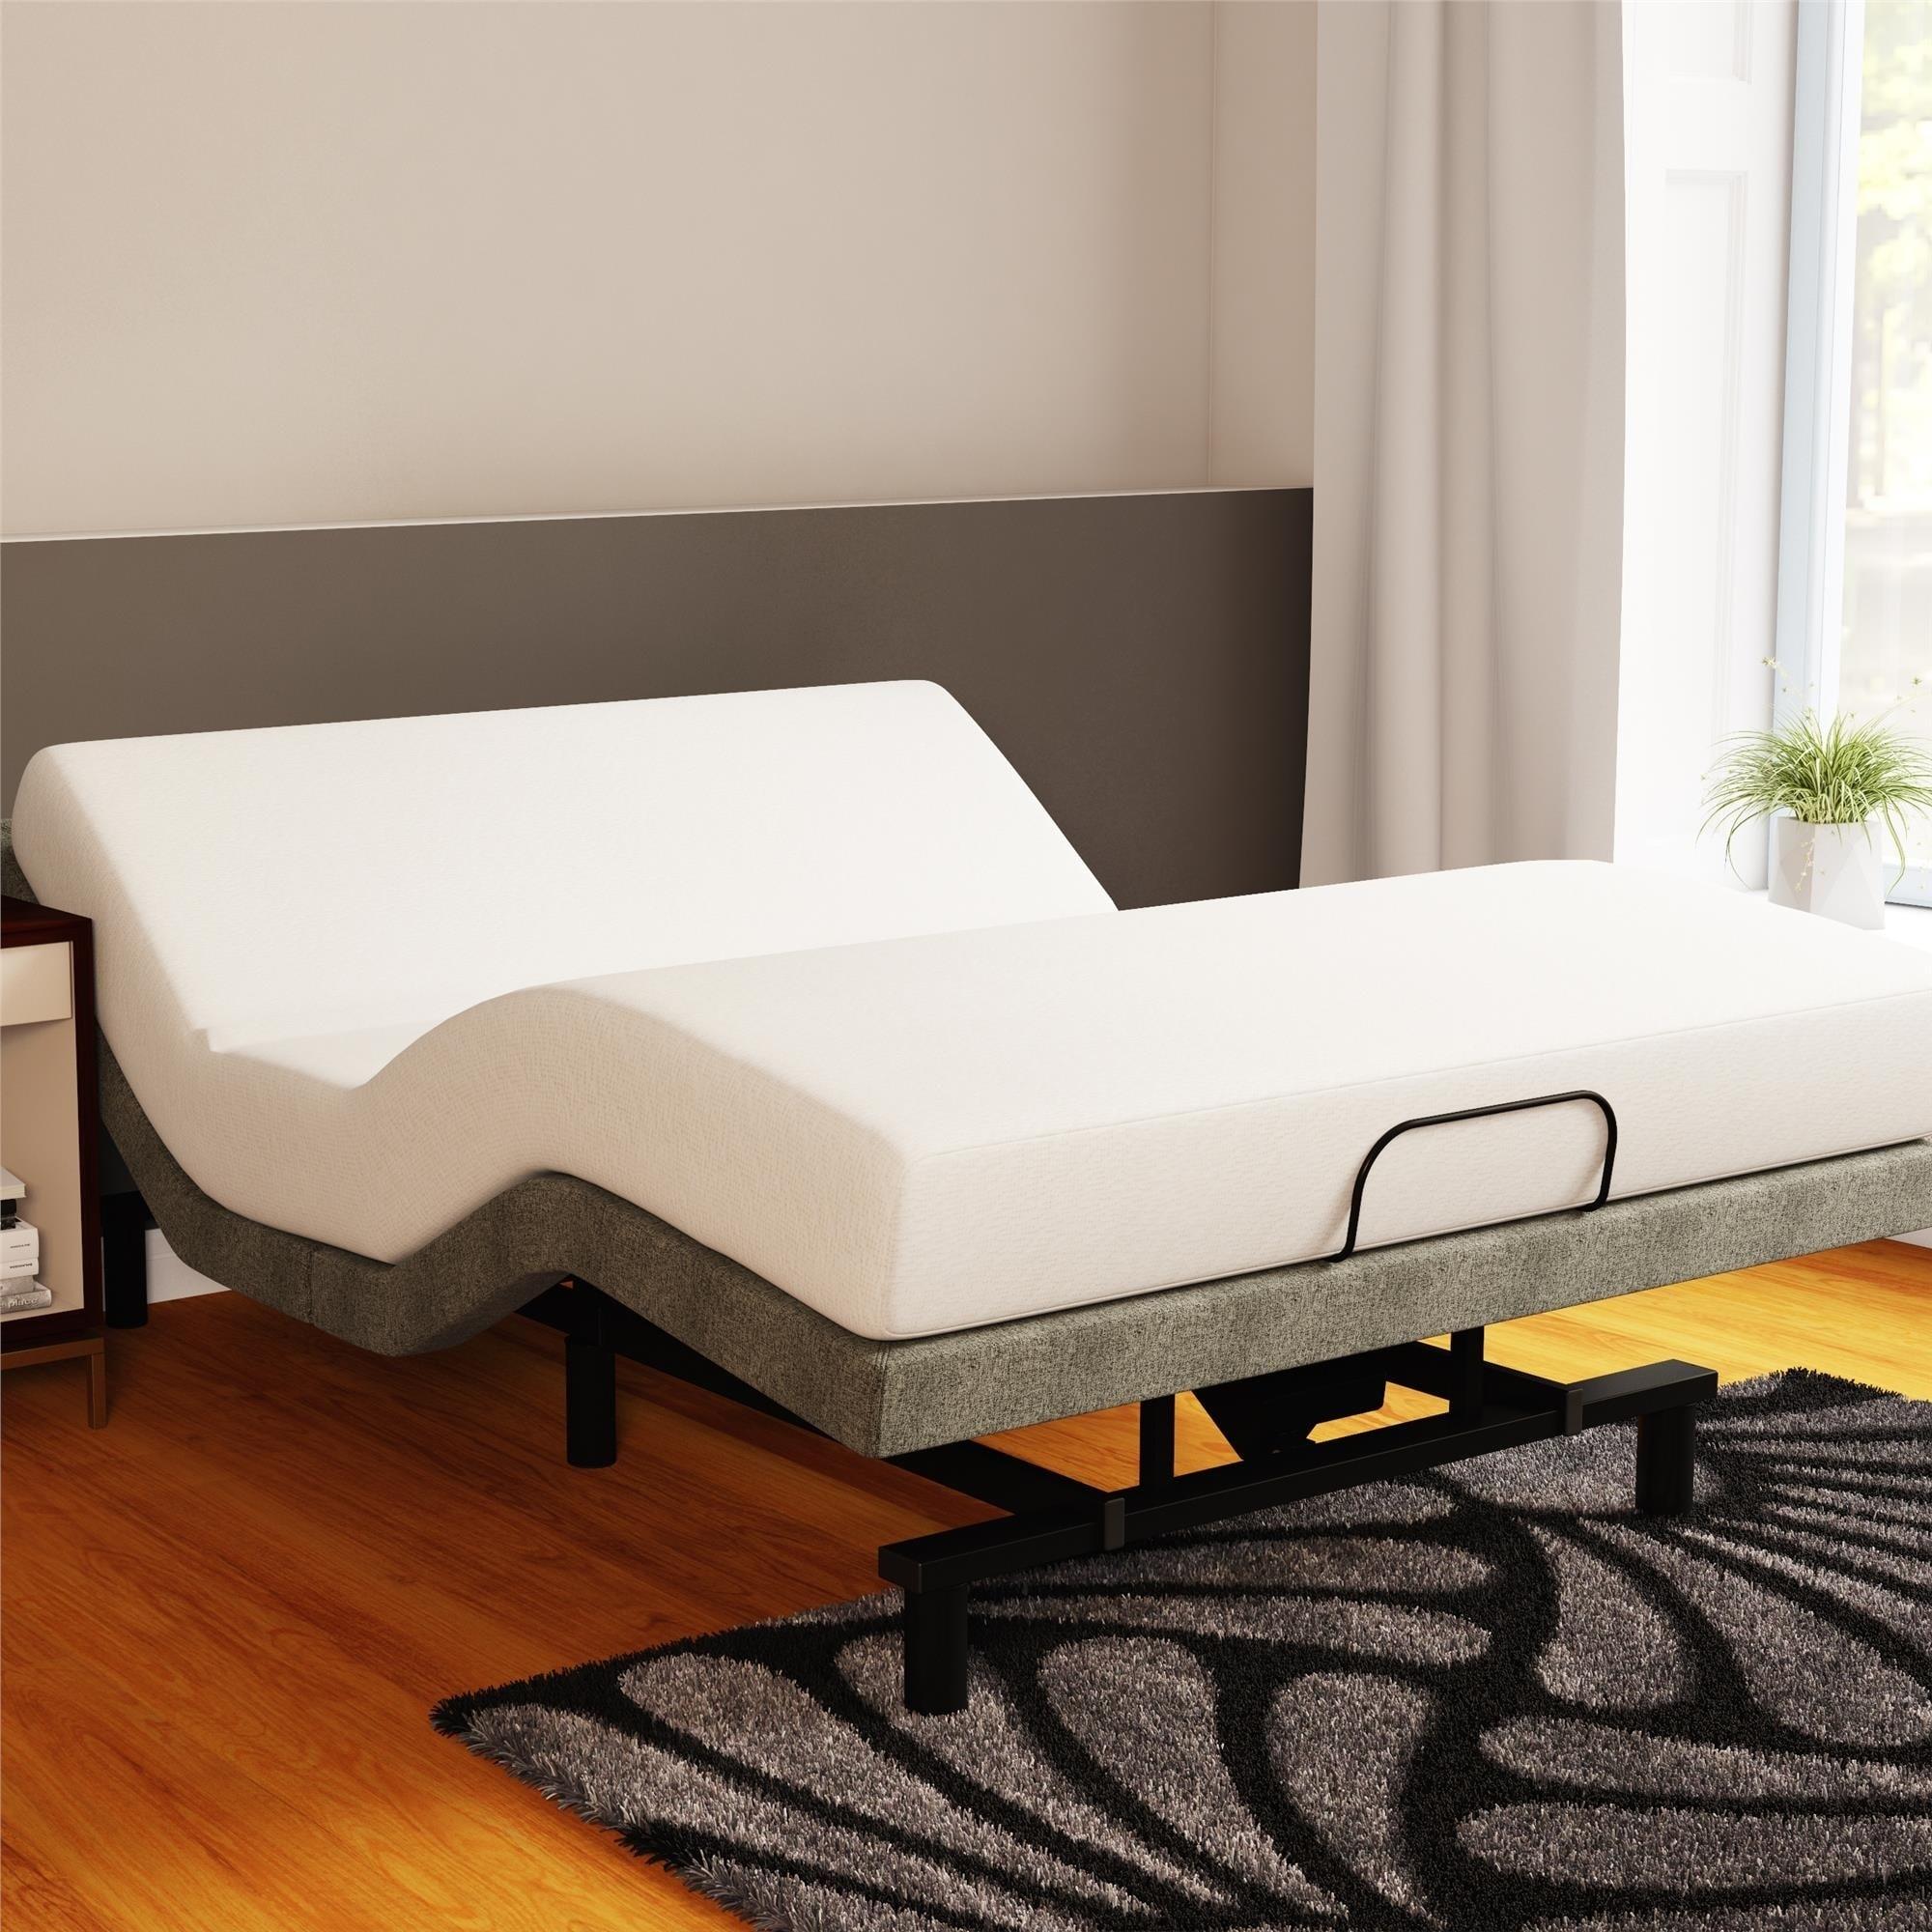 Shop Signature Sleep Memoir 8 Inch Memory Foam Mattress And Power